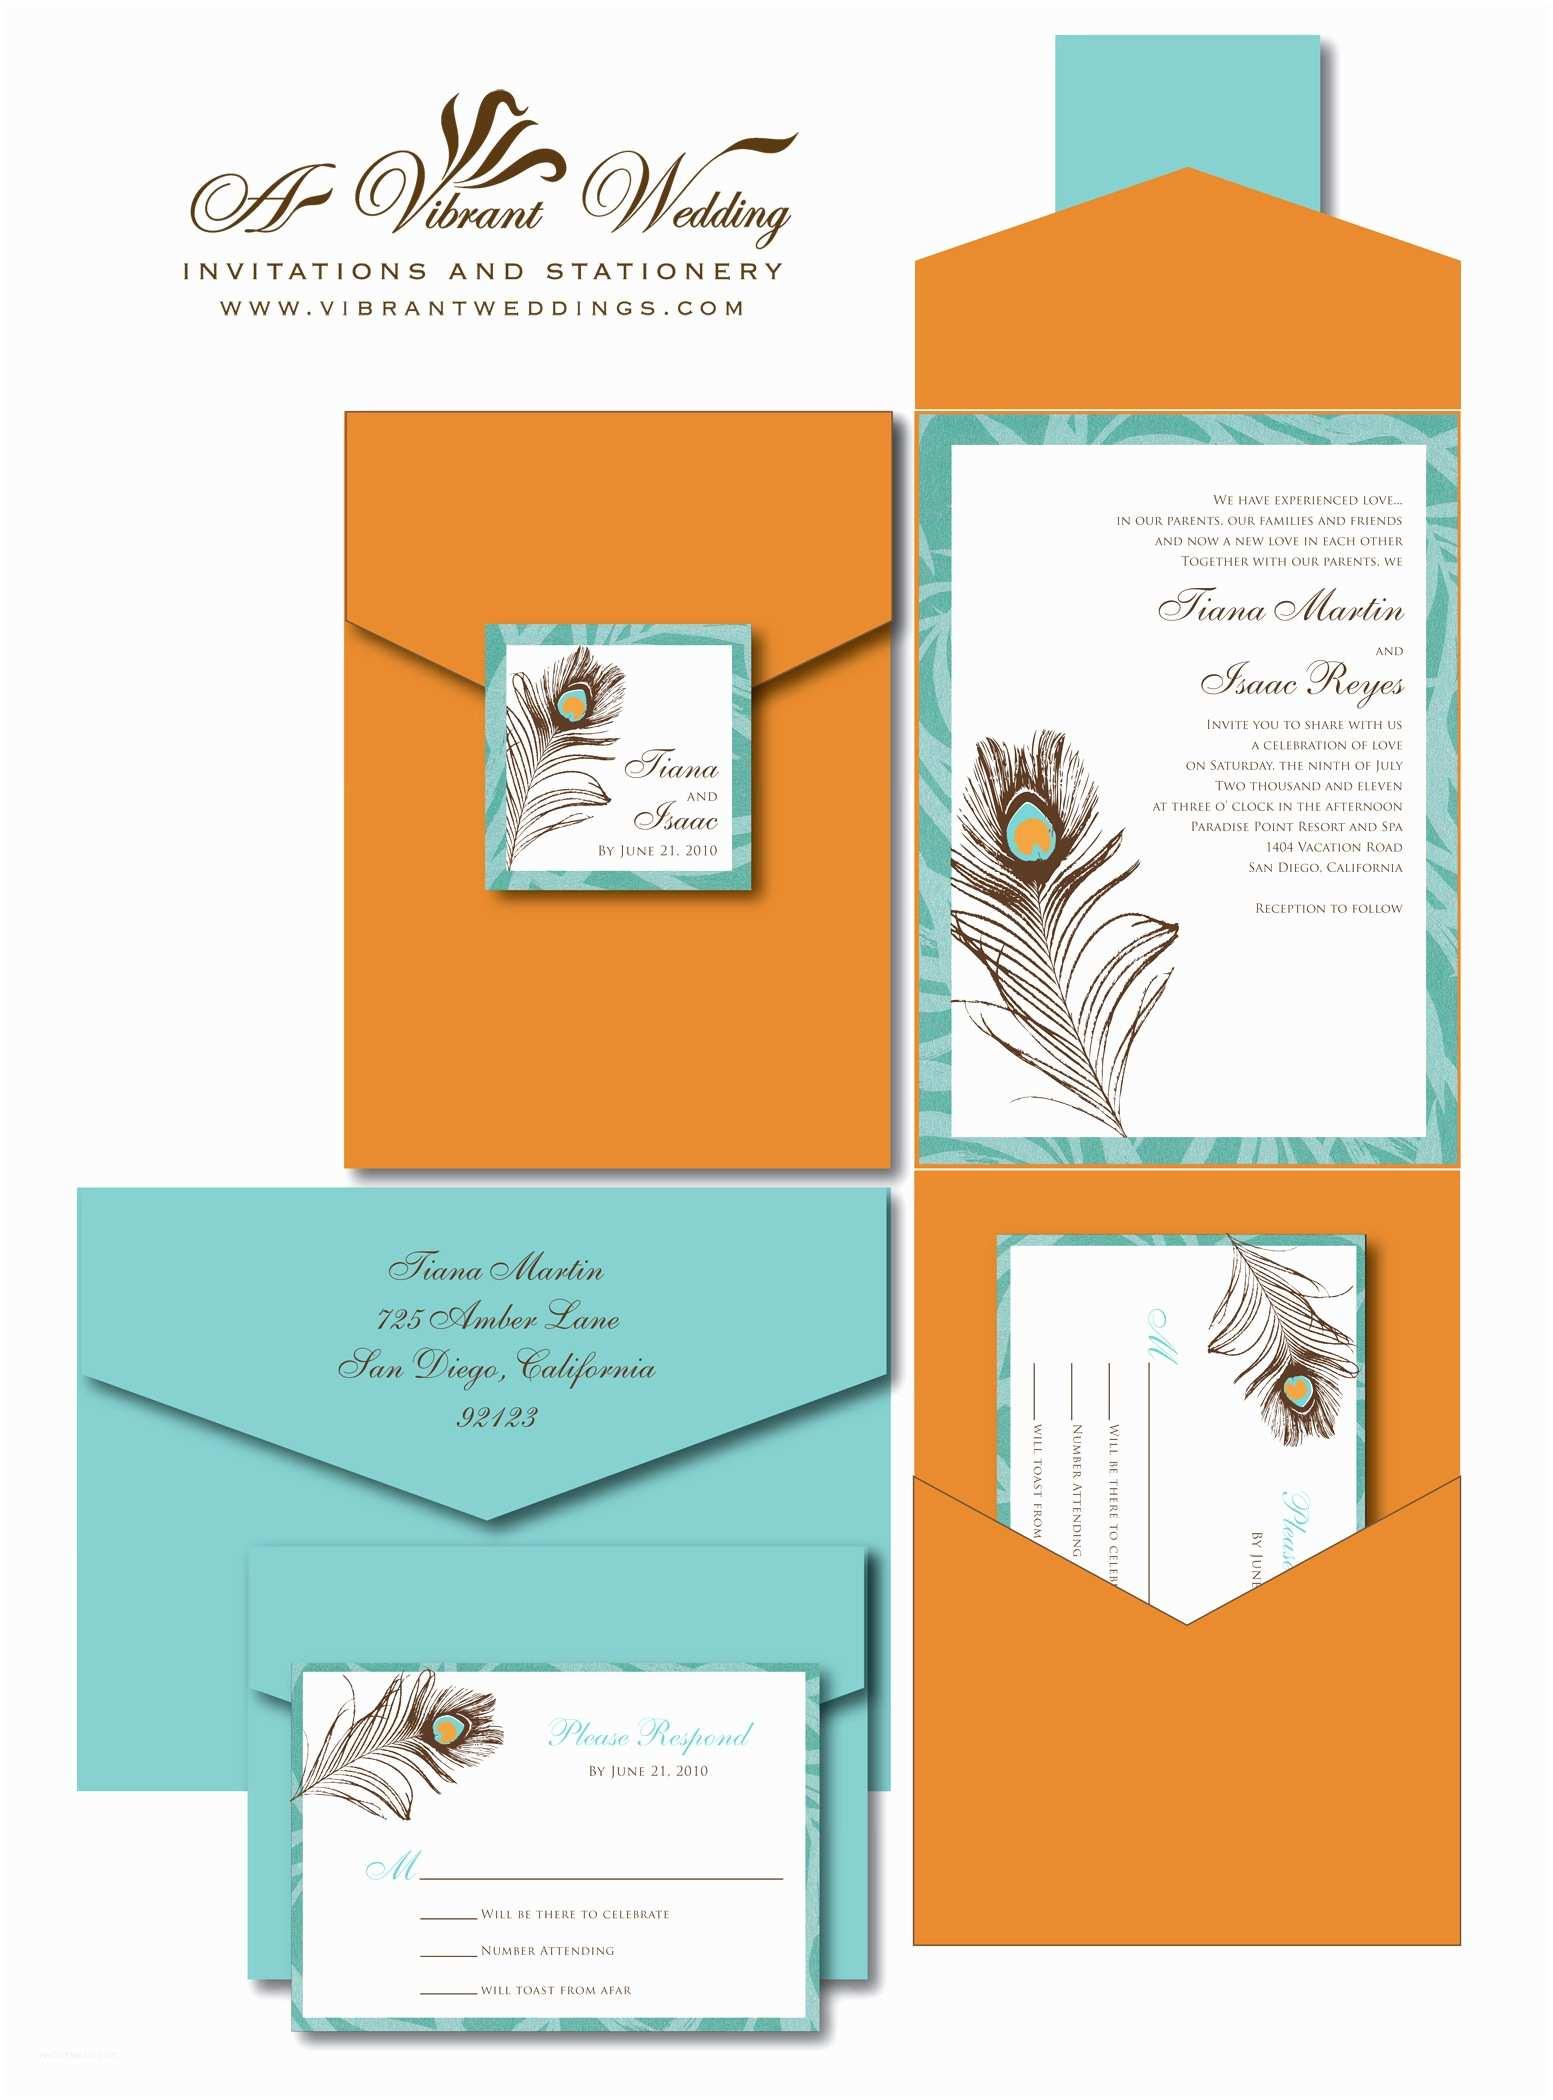 Orange Wedding Invitations Burnt orange & Turquoise Wedding Invitation with Peacock